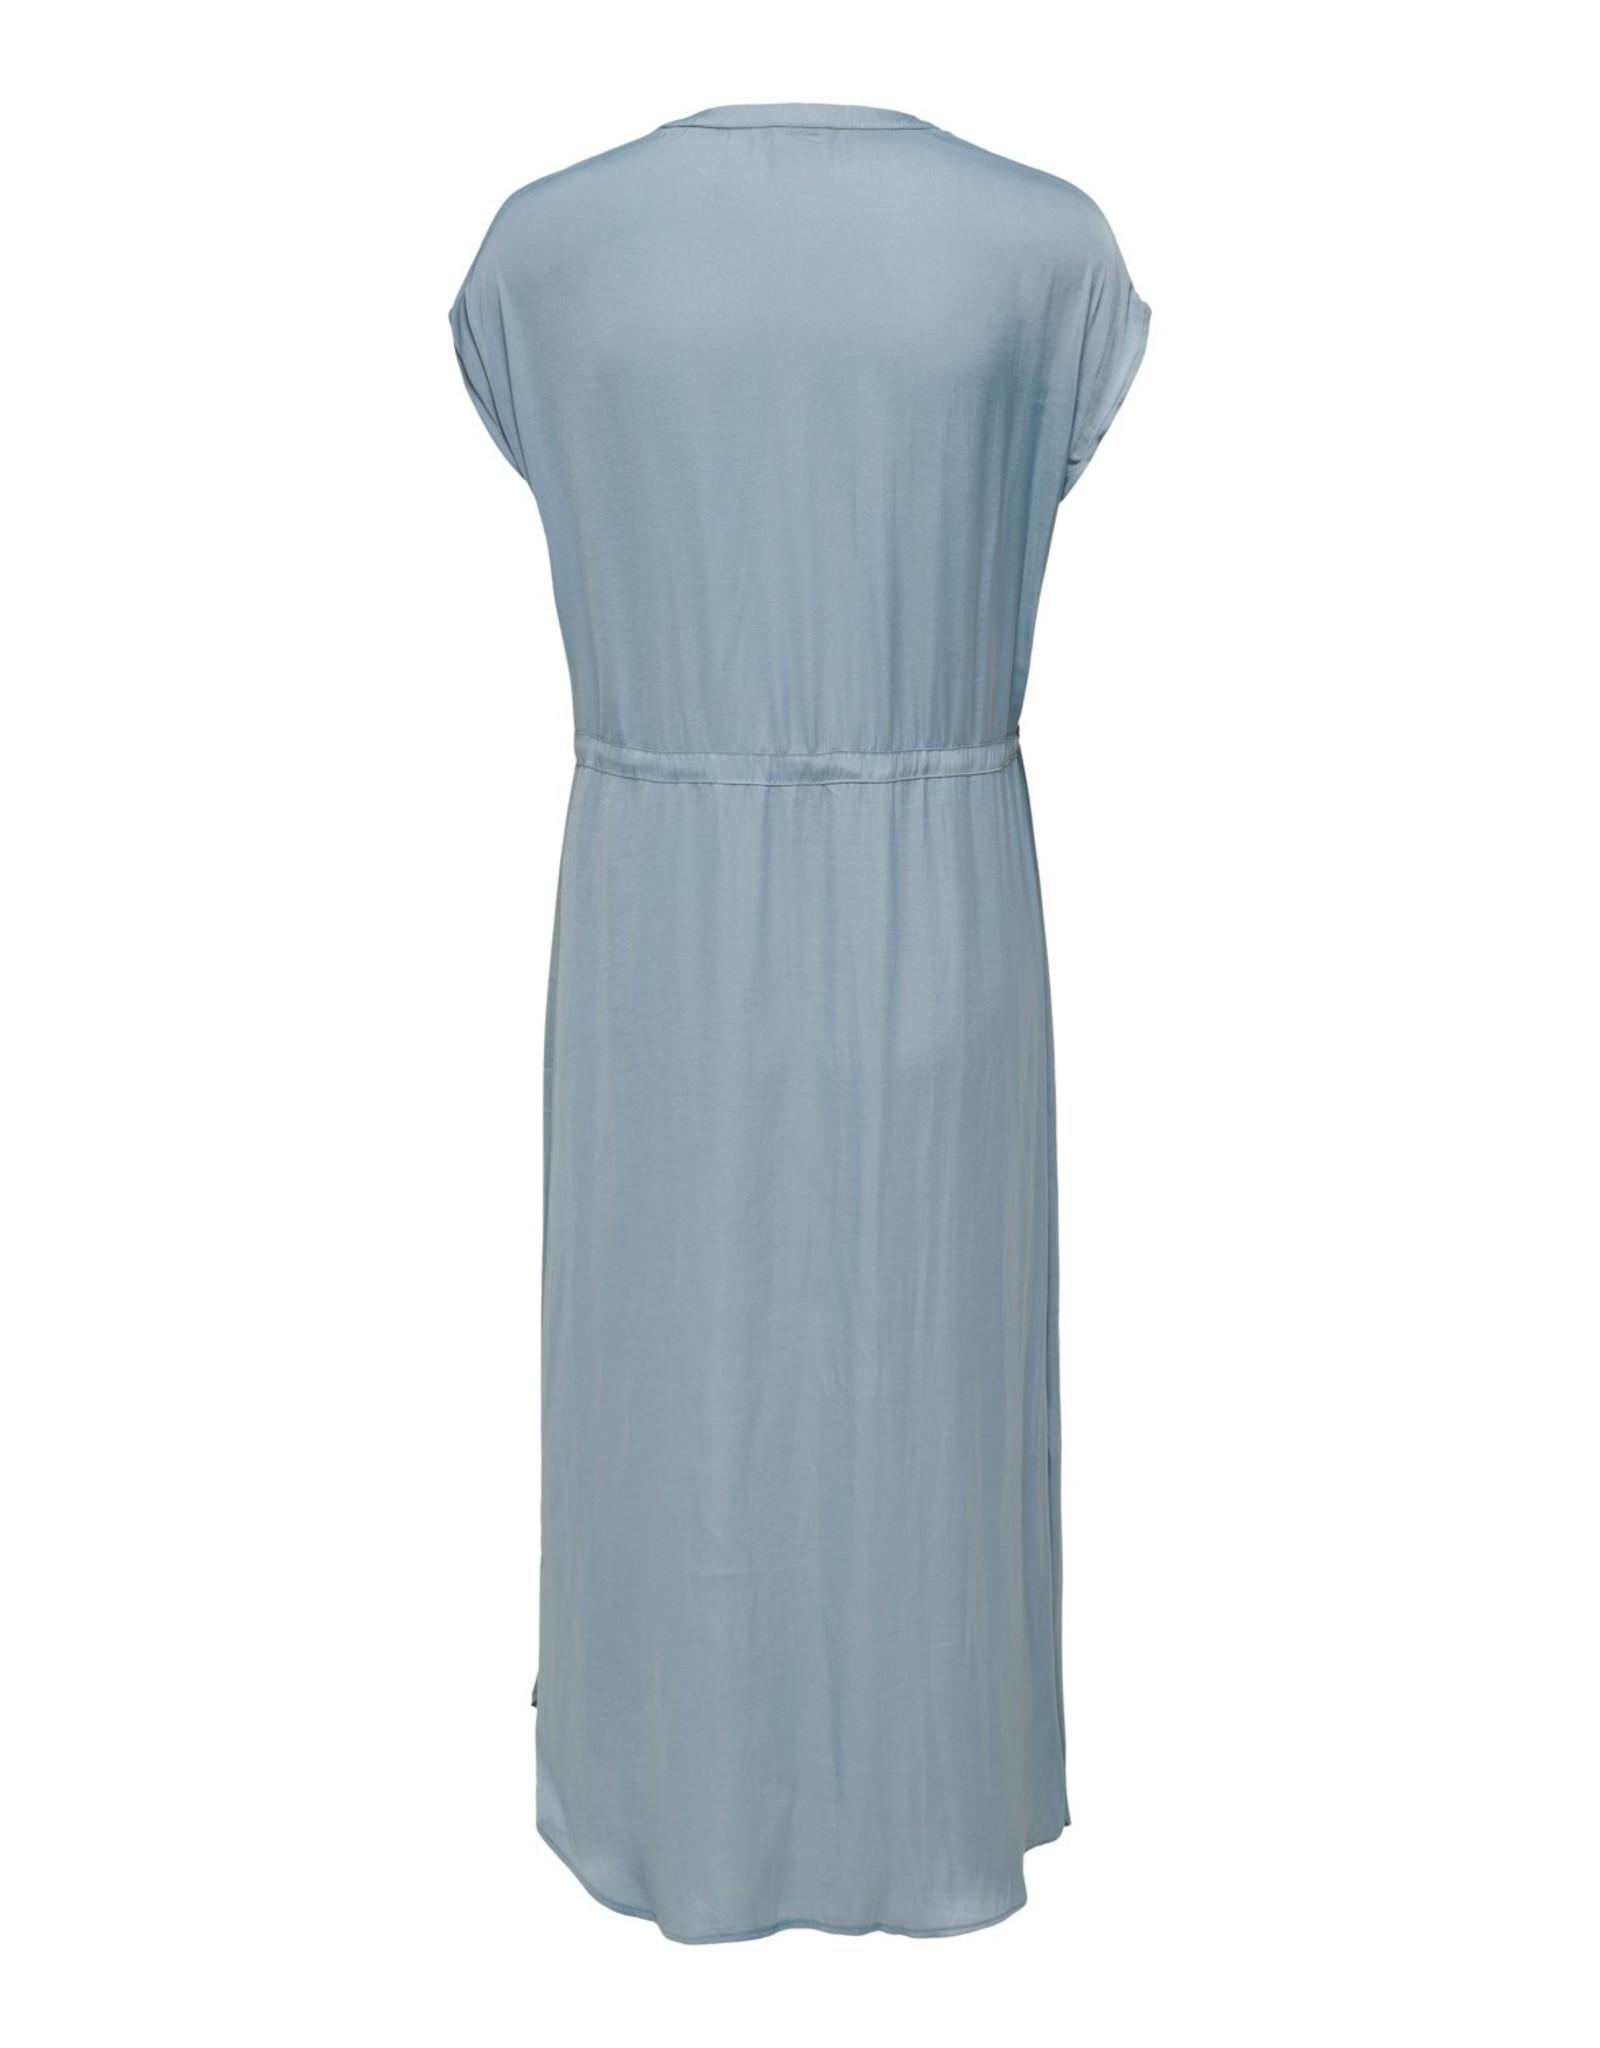 ZOE DRESS SOFT BLUE